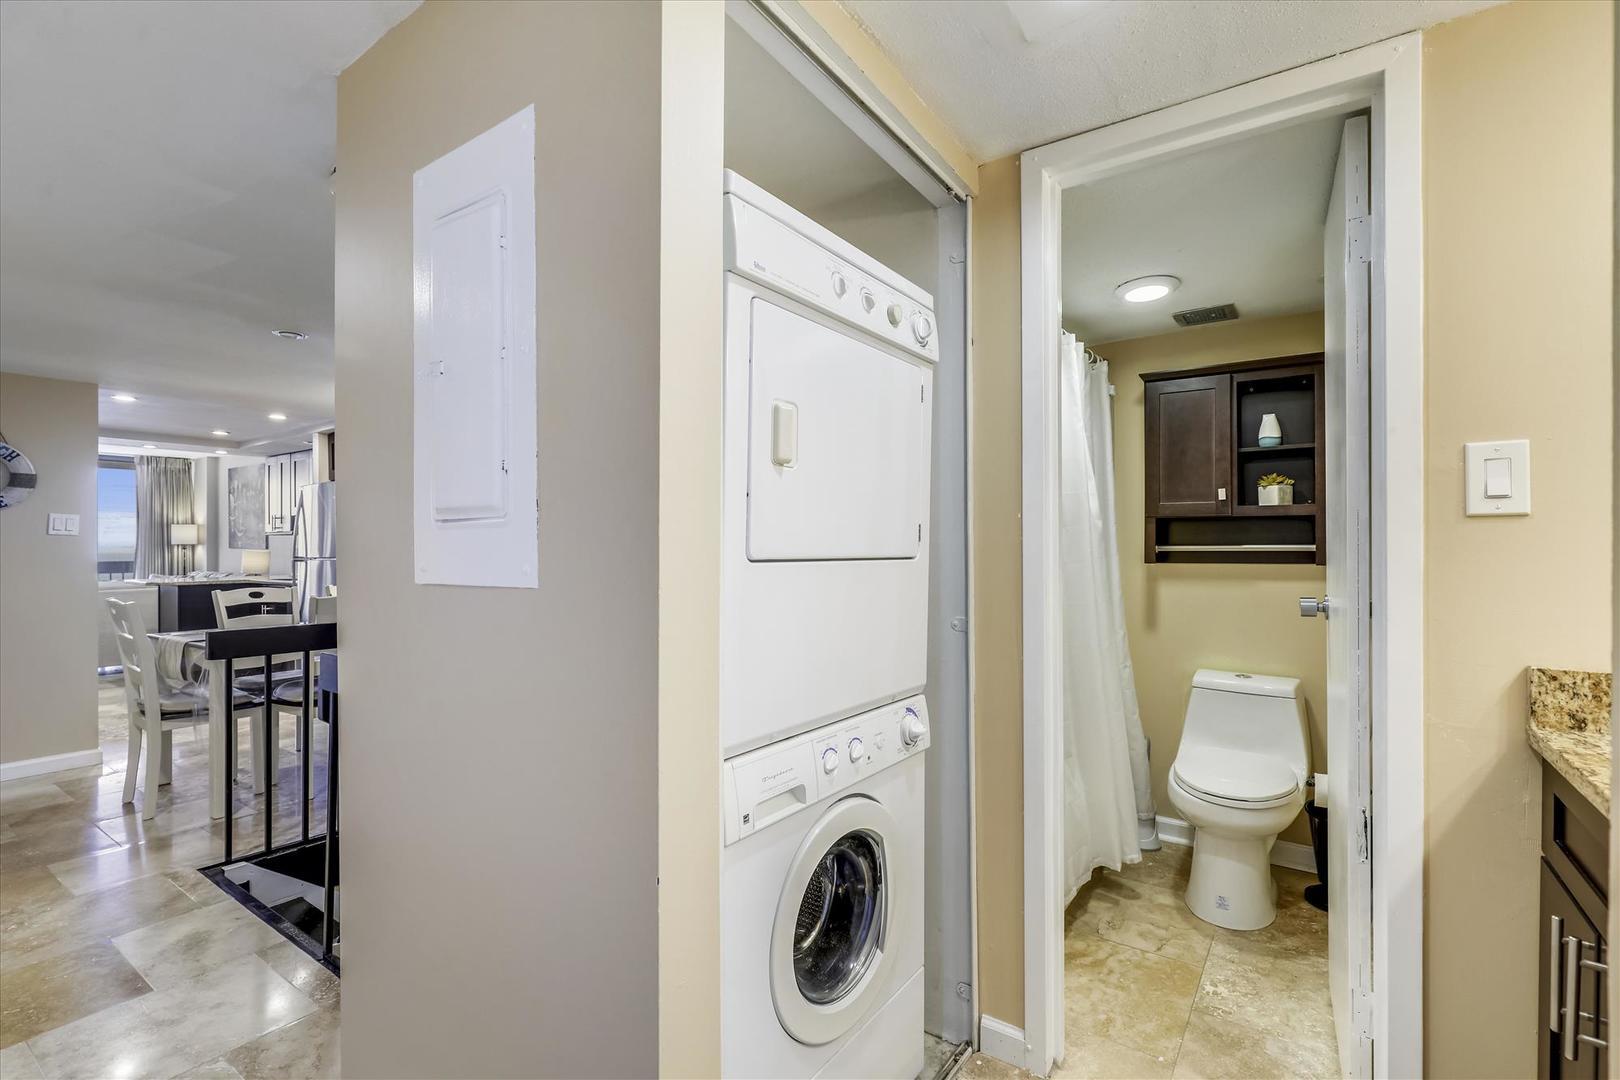 Century I 1909 - Laundry Area and Upper Bathroom